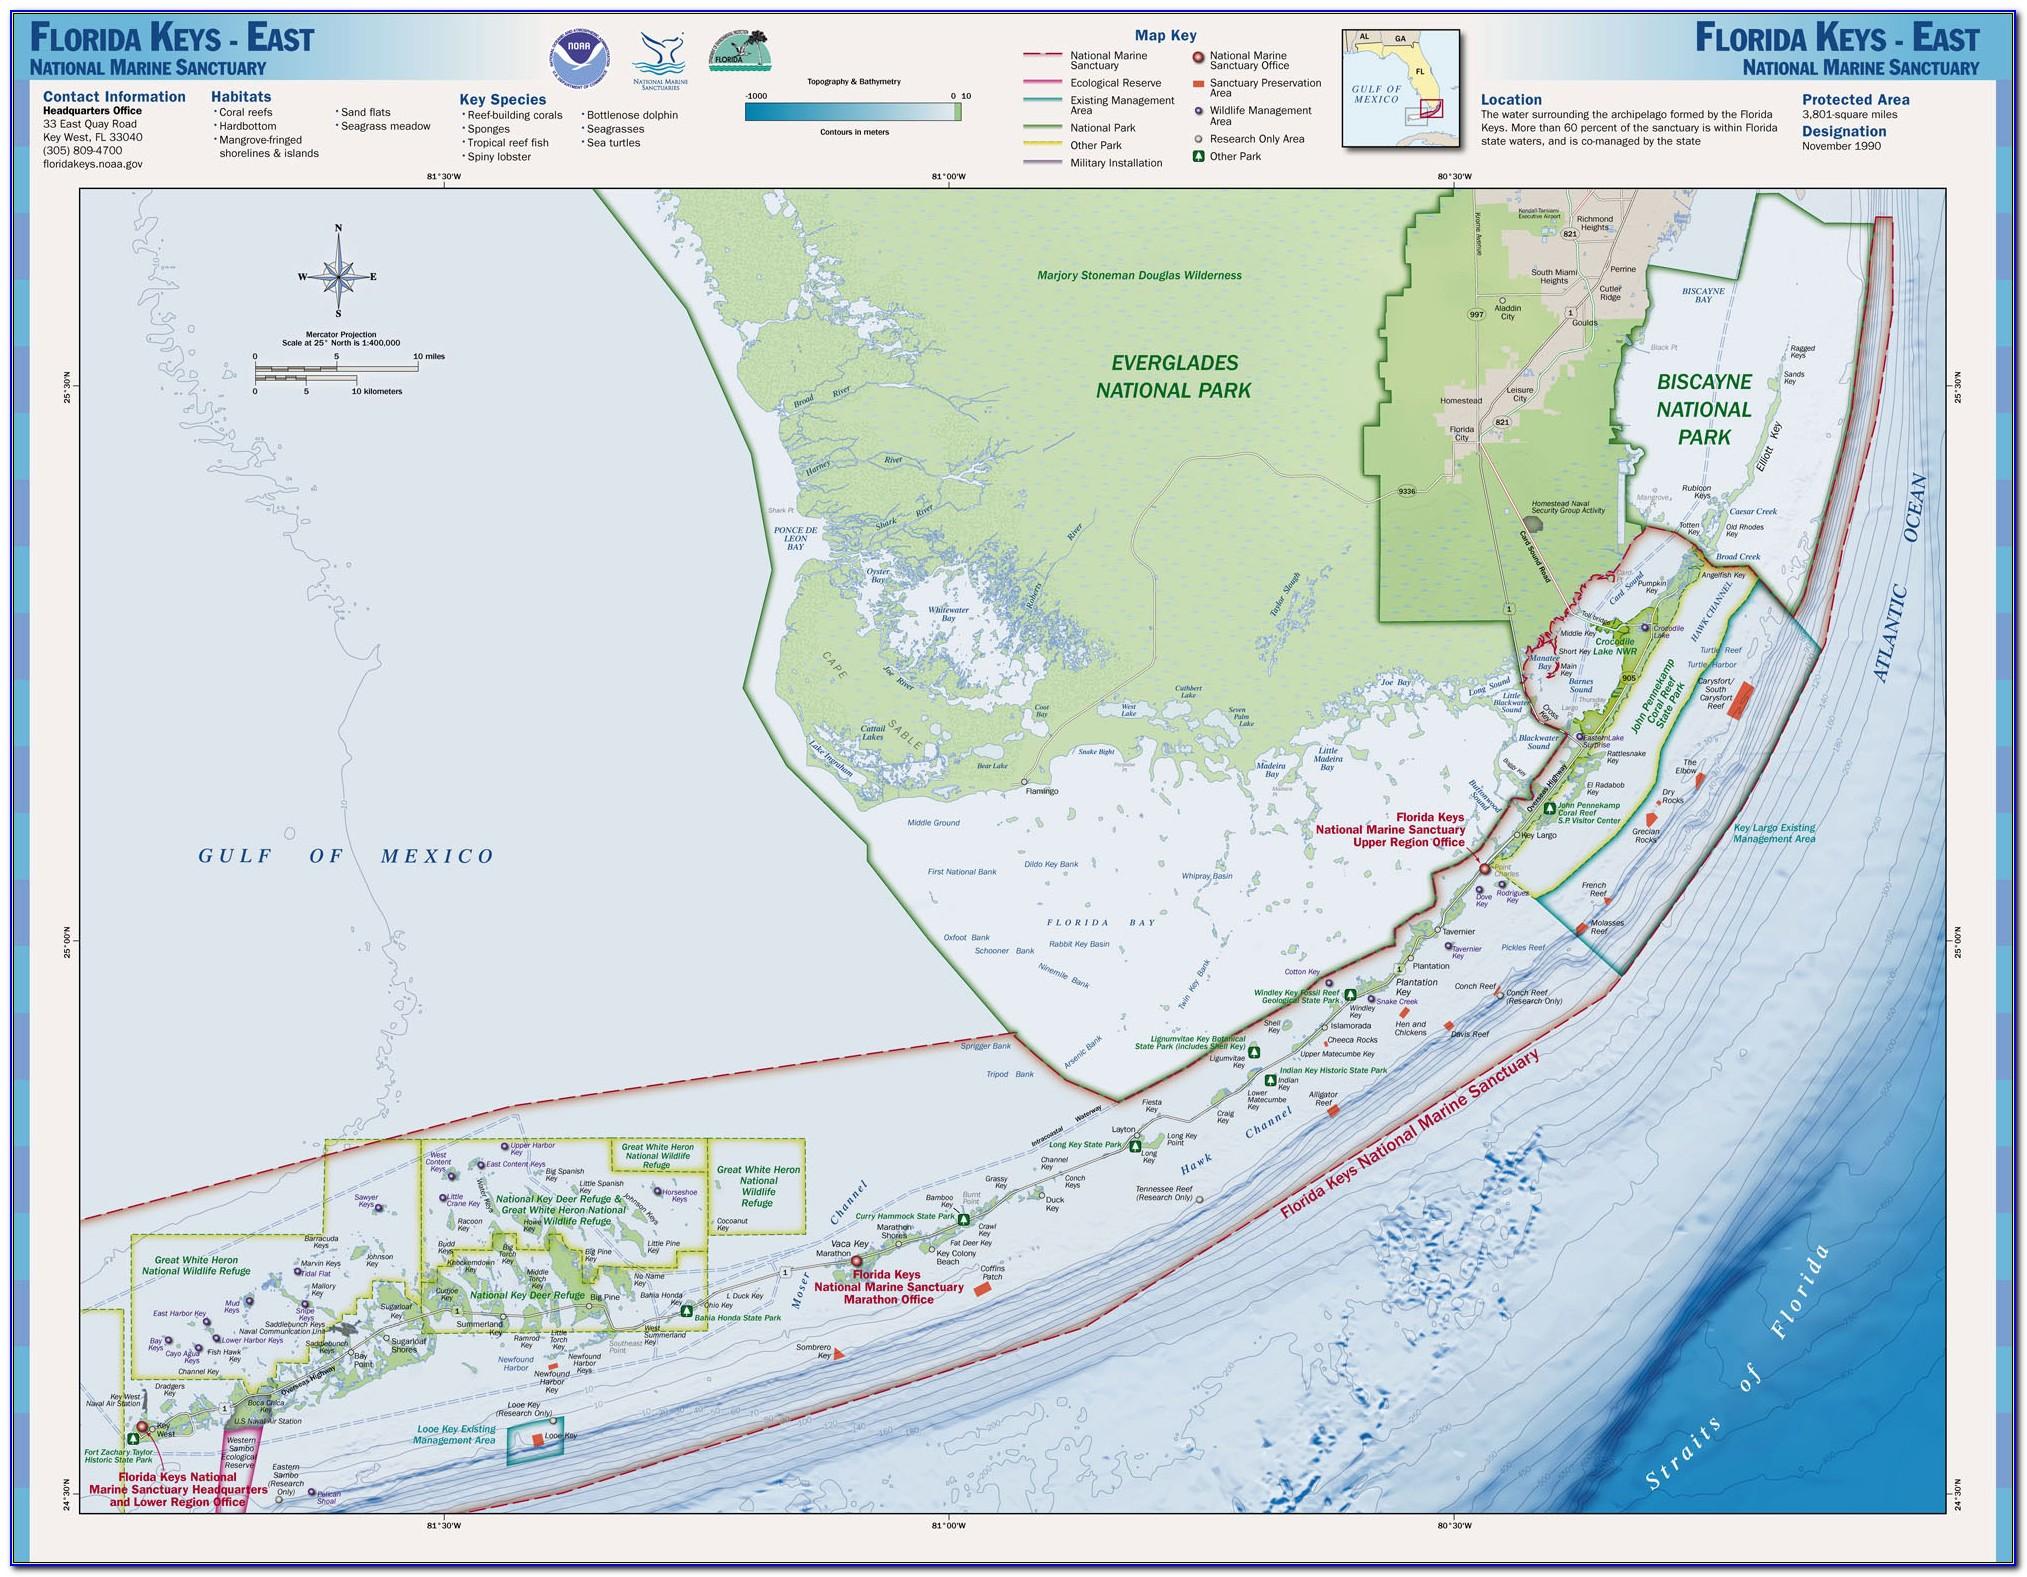 Nautical Map Of Florida Keys